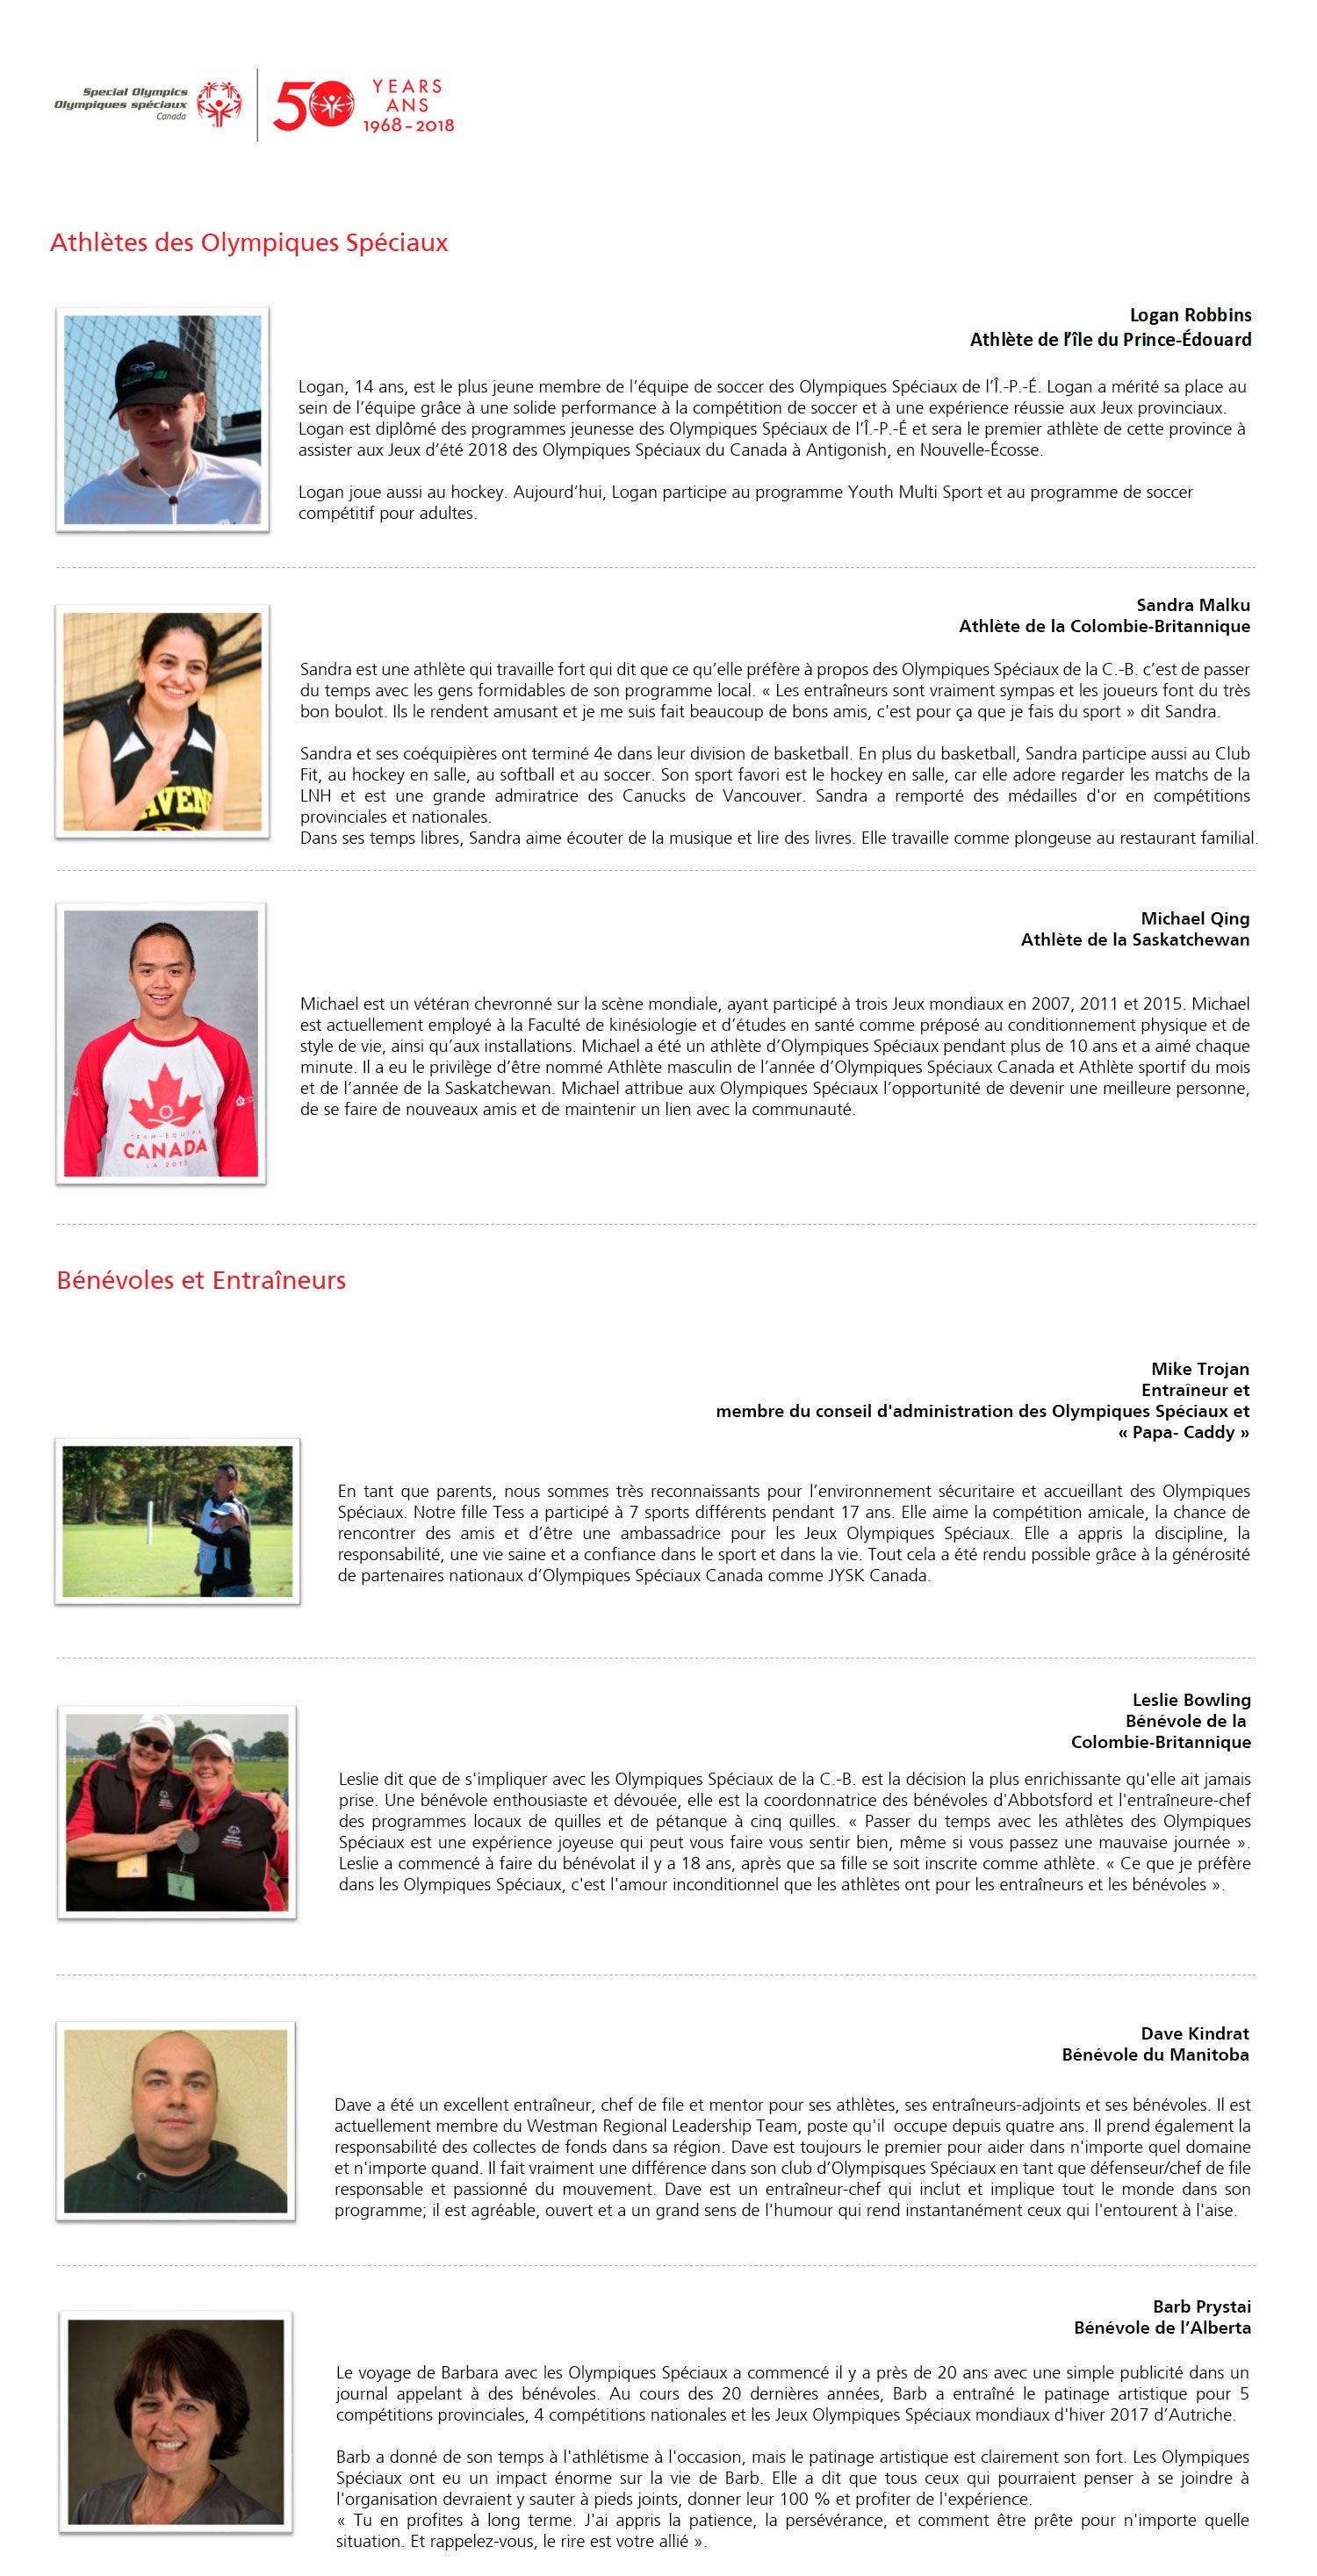 Special Olympics Testimonials